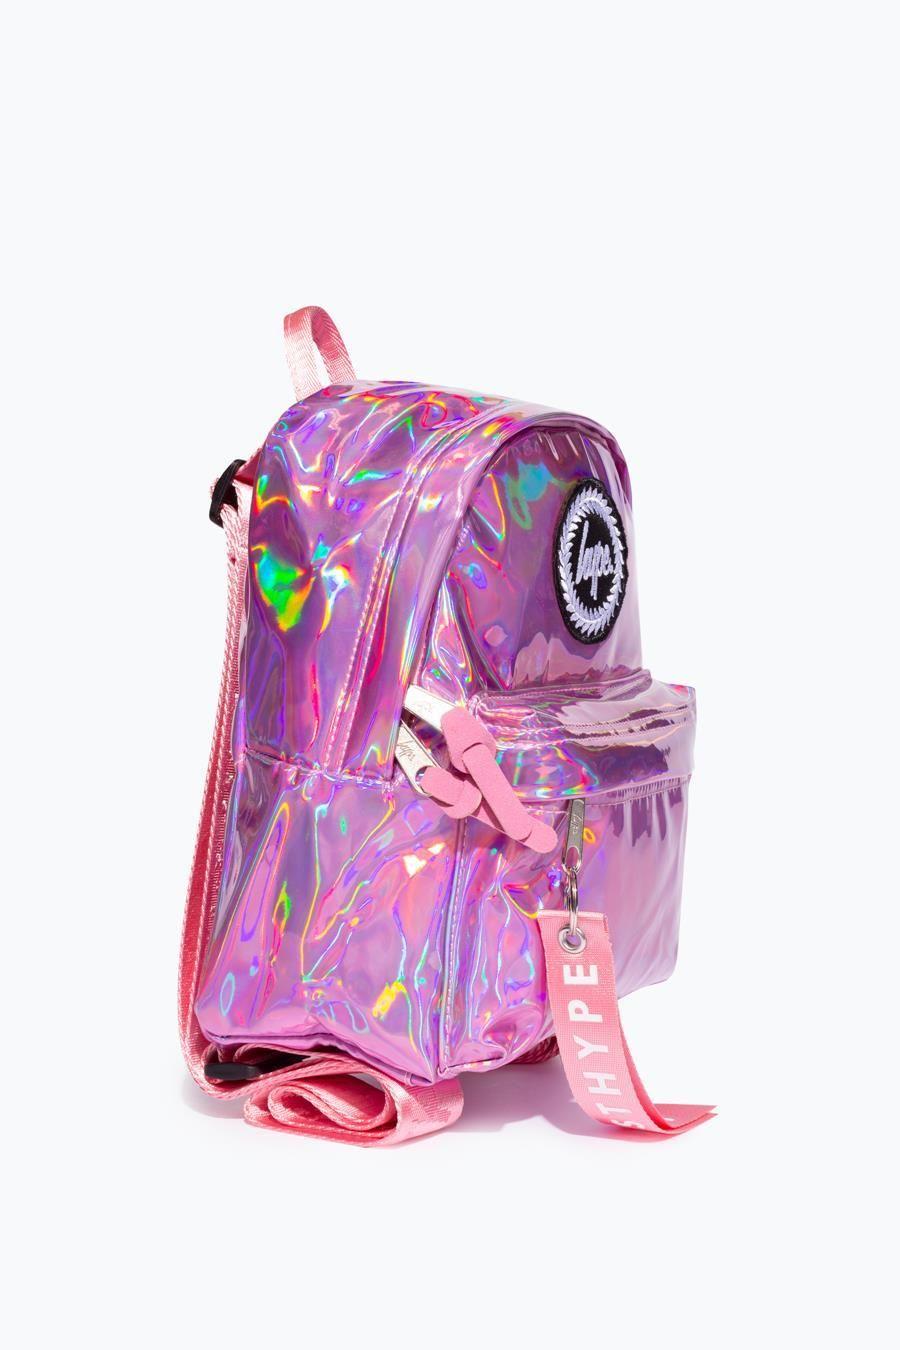 Hype Pink Holo Mini Backpack